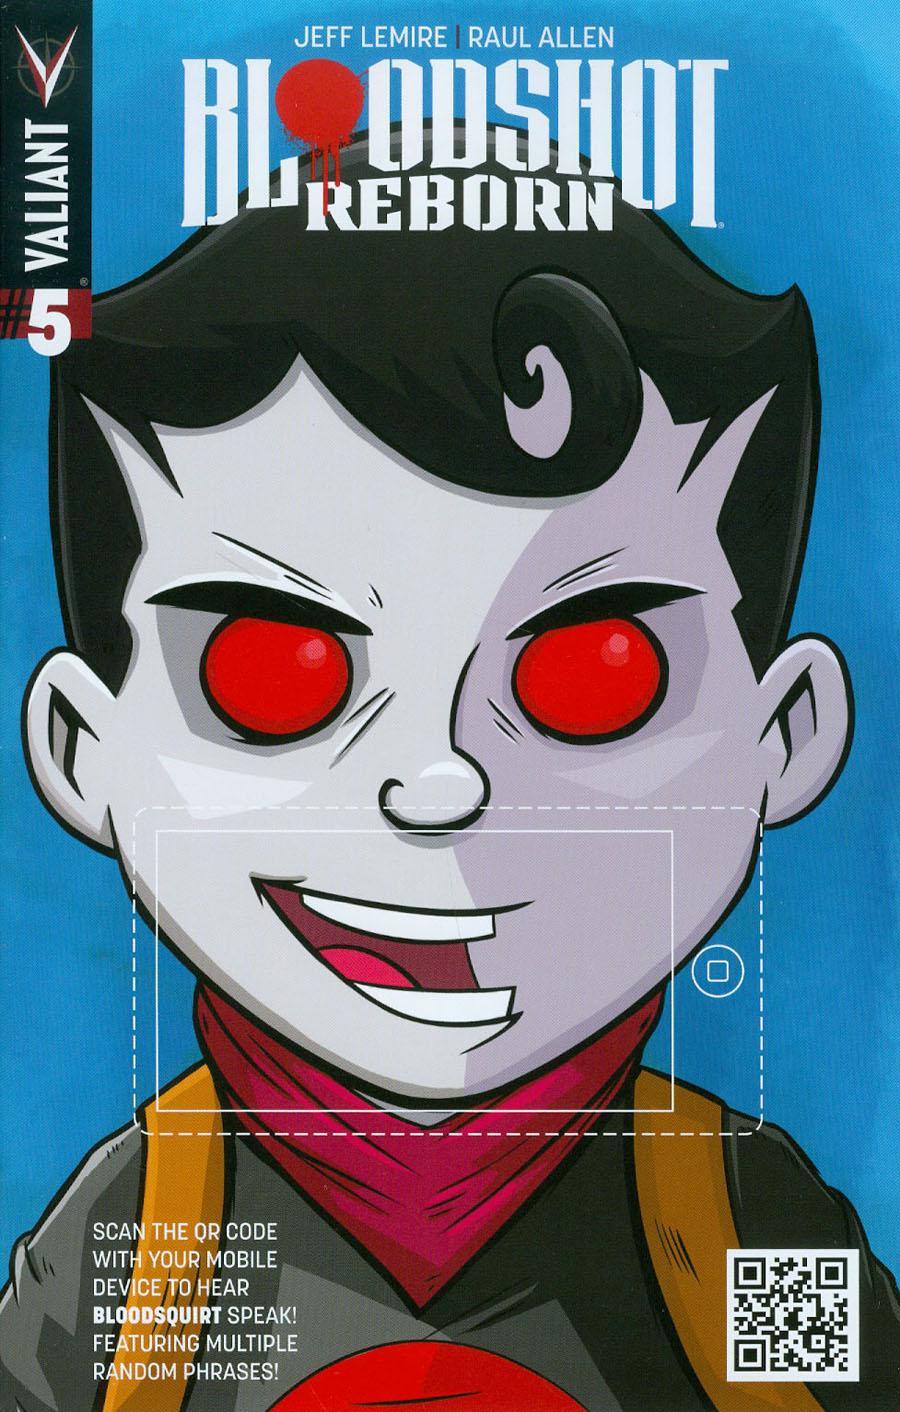 Bloodshot Reborn #5 Cover C Variant Jay Fabares QR Voice Cover